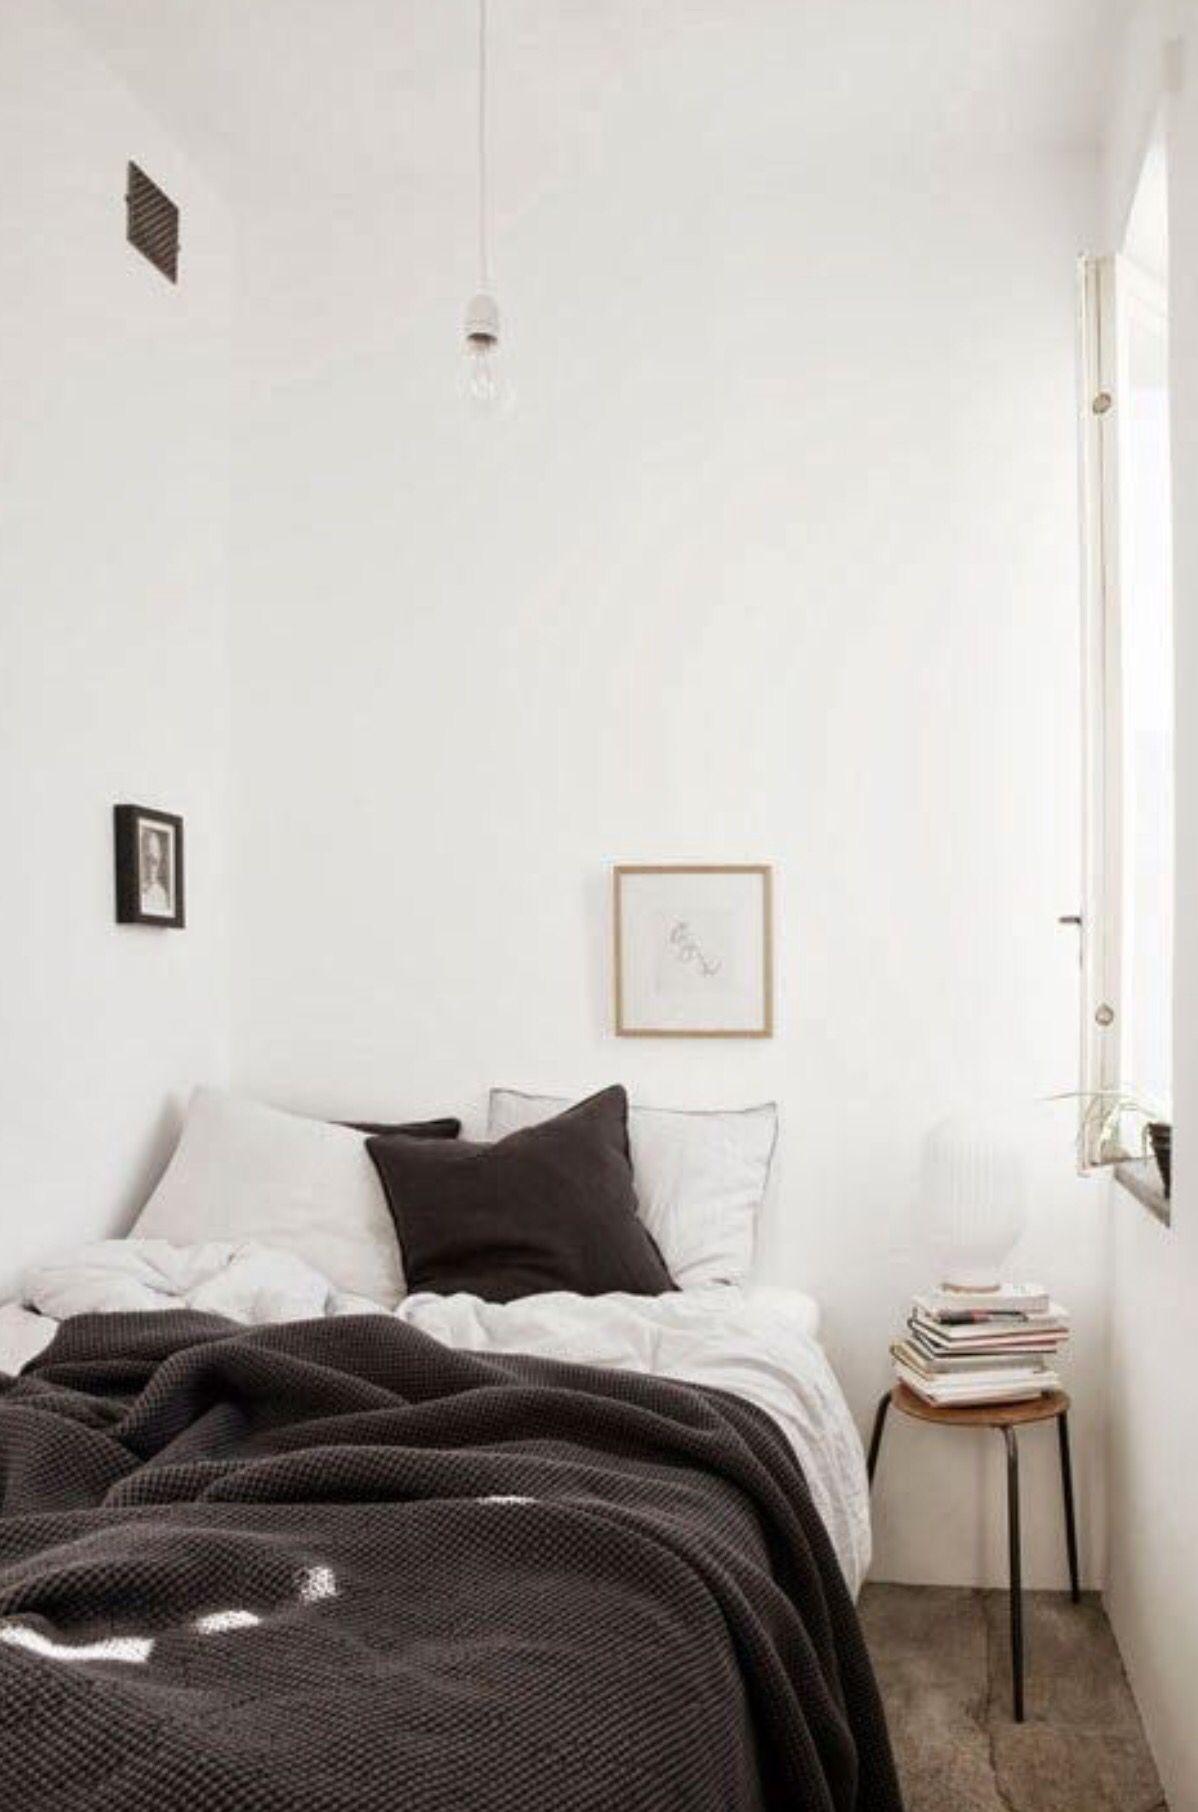 bemz in bed bedroom pin grimen modern minimal frames a with unbleached ikea belgian frame linen cover